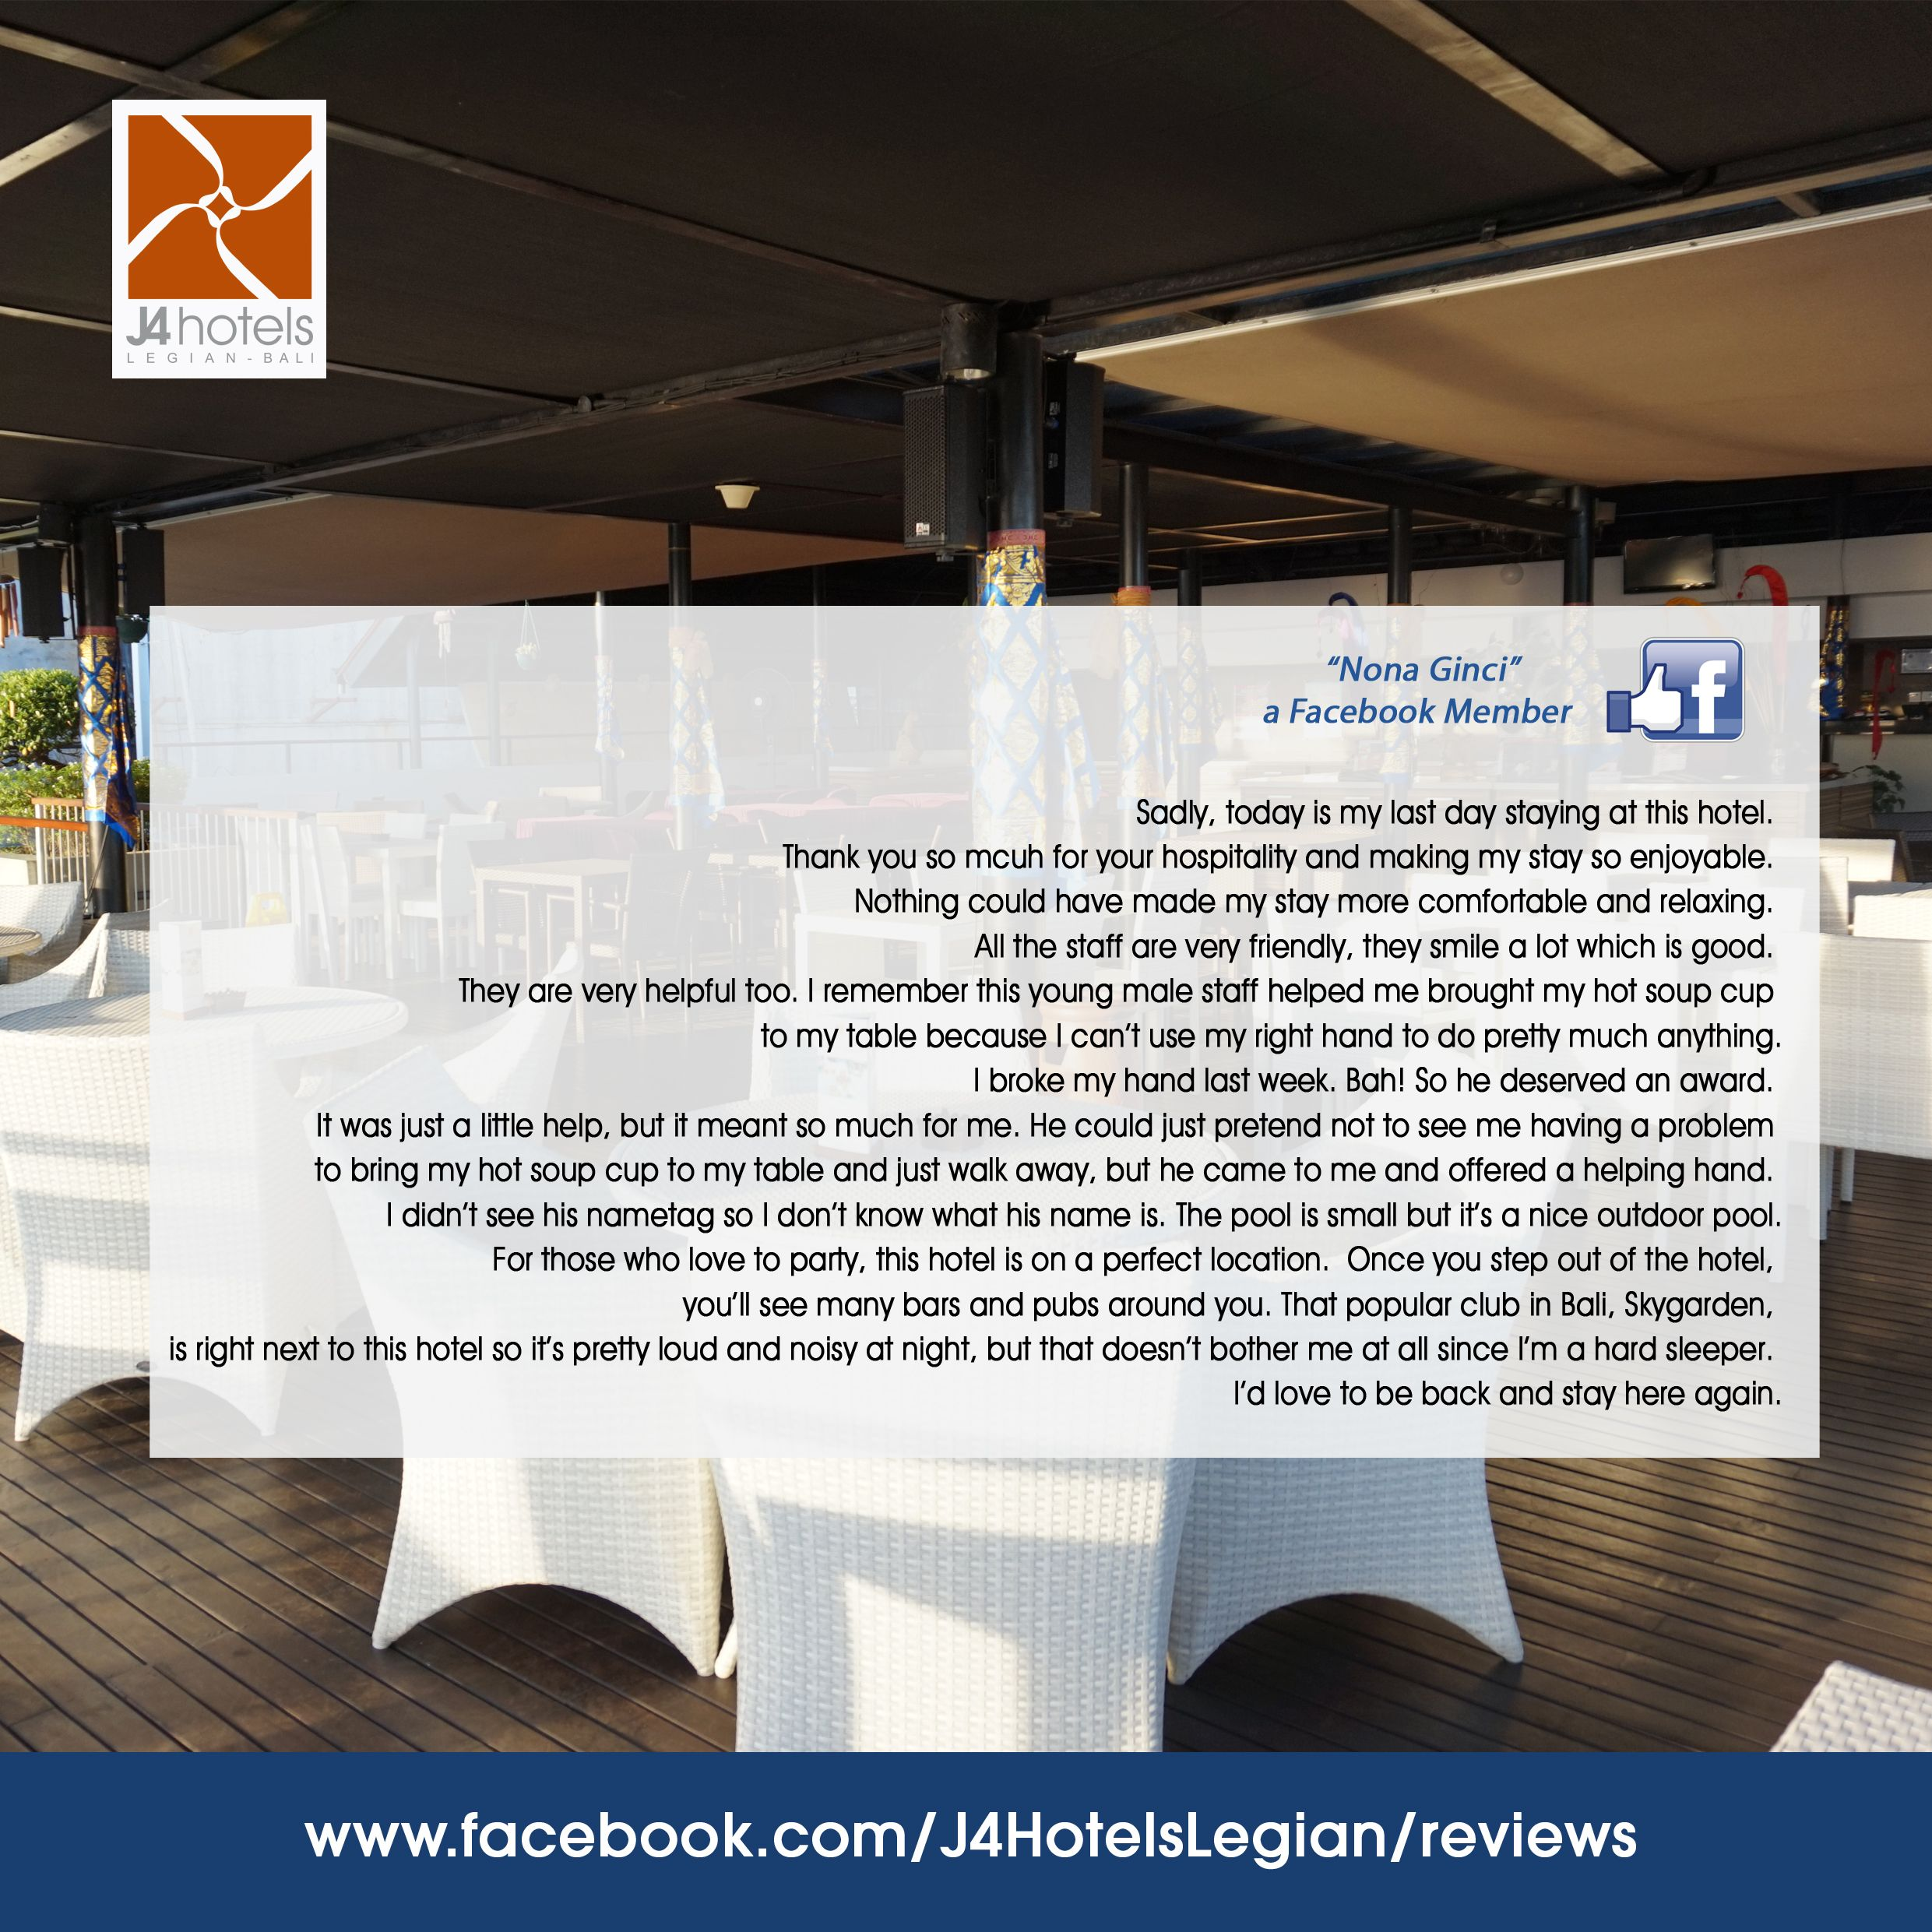 . . . #J4hotelslegian #J4hotels #LifestyleHotel #Lifestyle #HotelBali #Holiday #InstaTravel  #Vacation #LegianBali #Wanderlust #Destination #LegianStreet #RoofTopPool #RoofTopSwimmingPool #Bali #Indonesia #HappyHour #Traveler #Backpacker #HappyLife #J4Offer #Funtastic #Promo #Pizza #Beer #Review #lovelyGuest